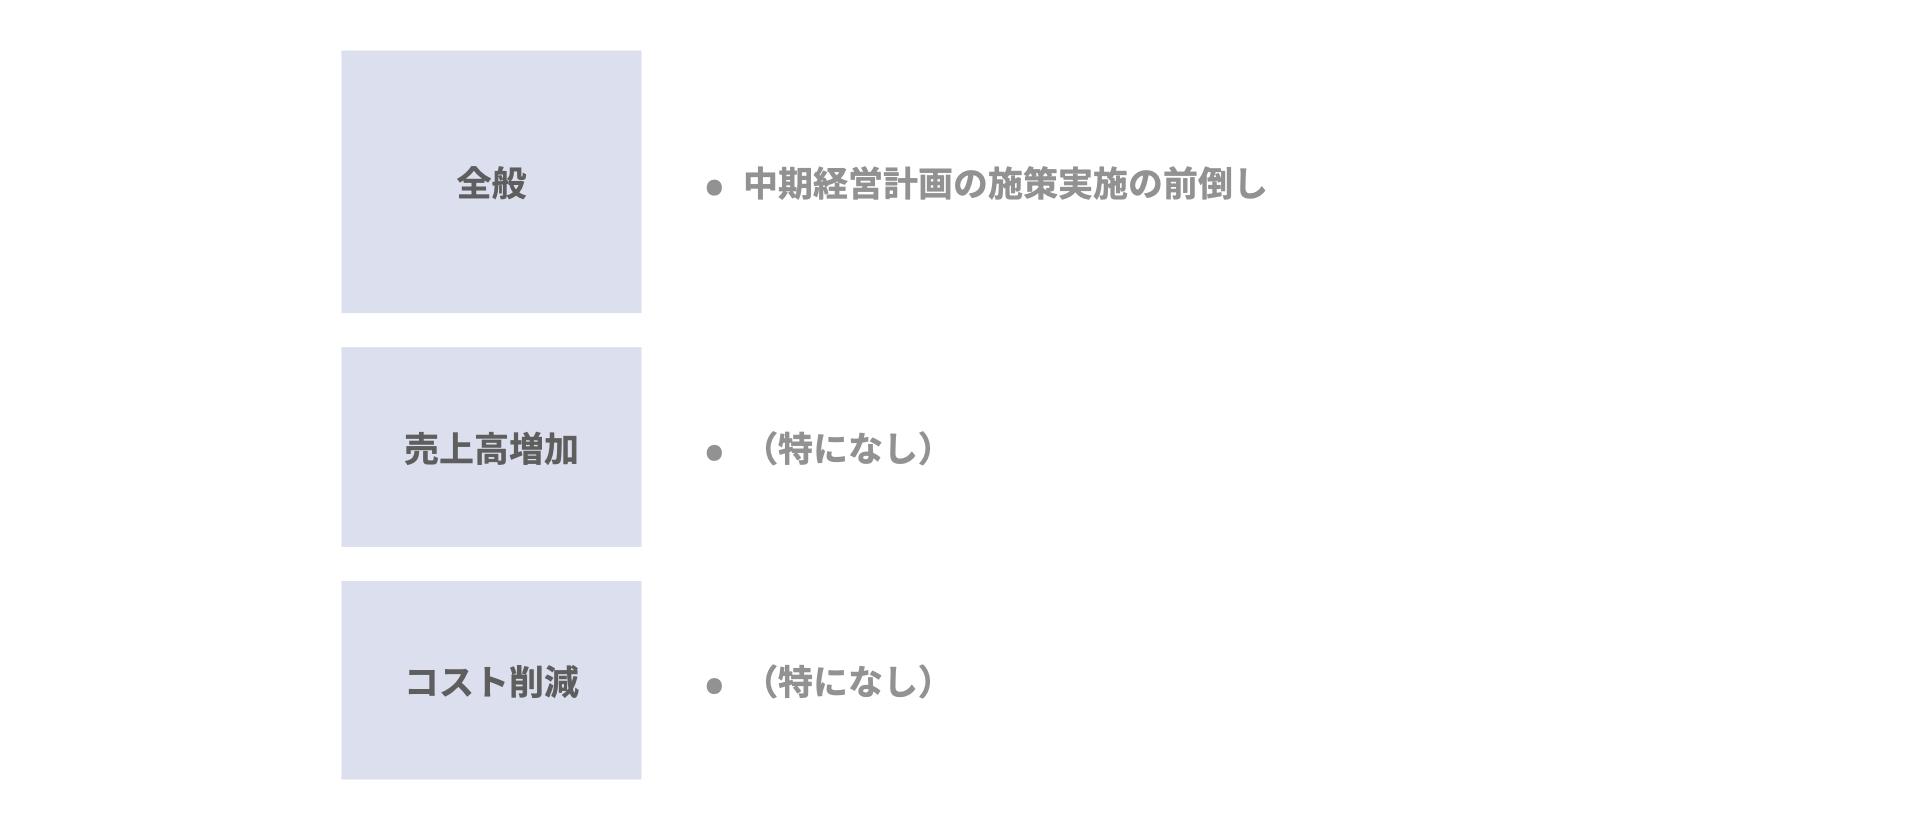 AOI TYOのファンドMBOによる非公開化(カーライル)の非公開化後の経営方針